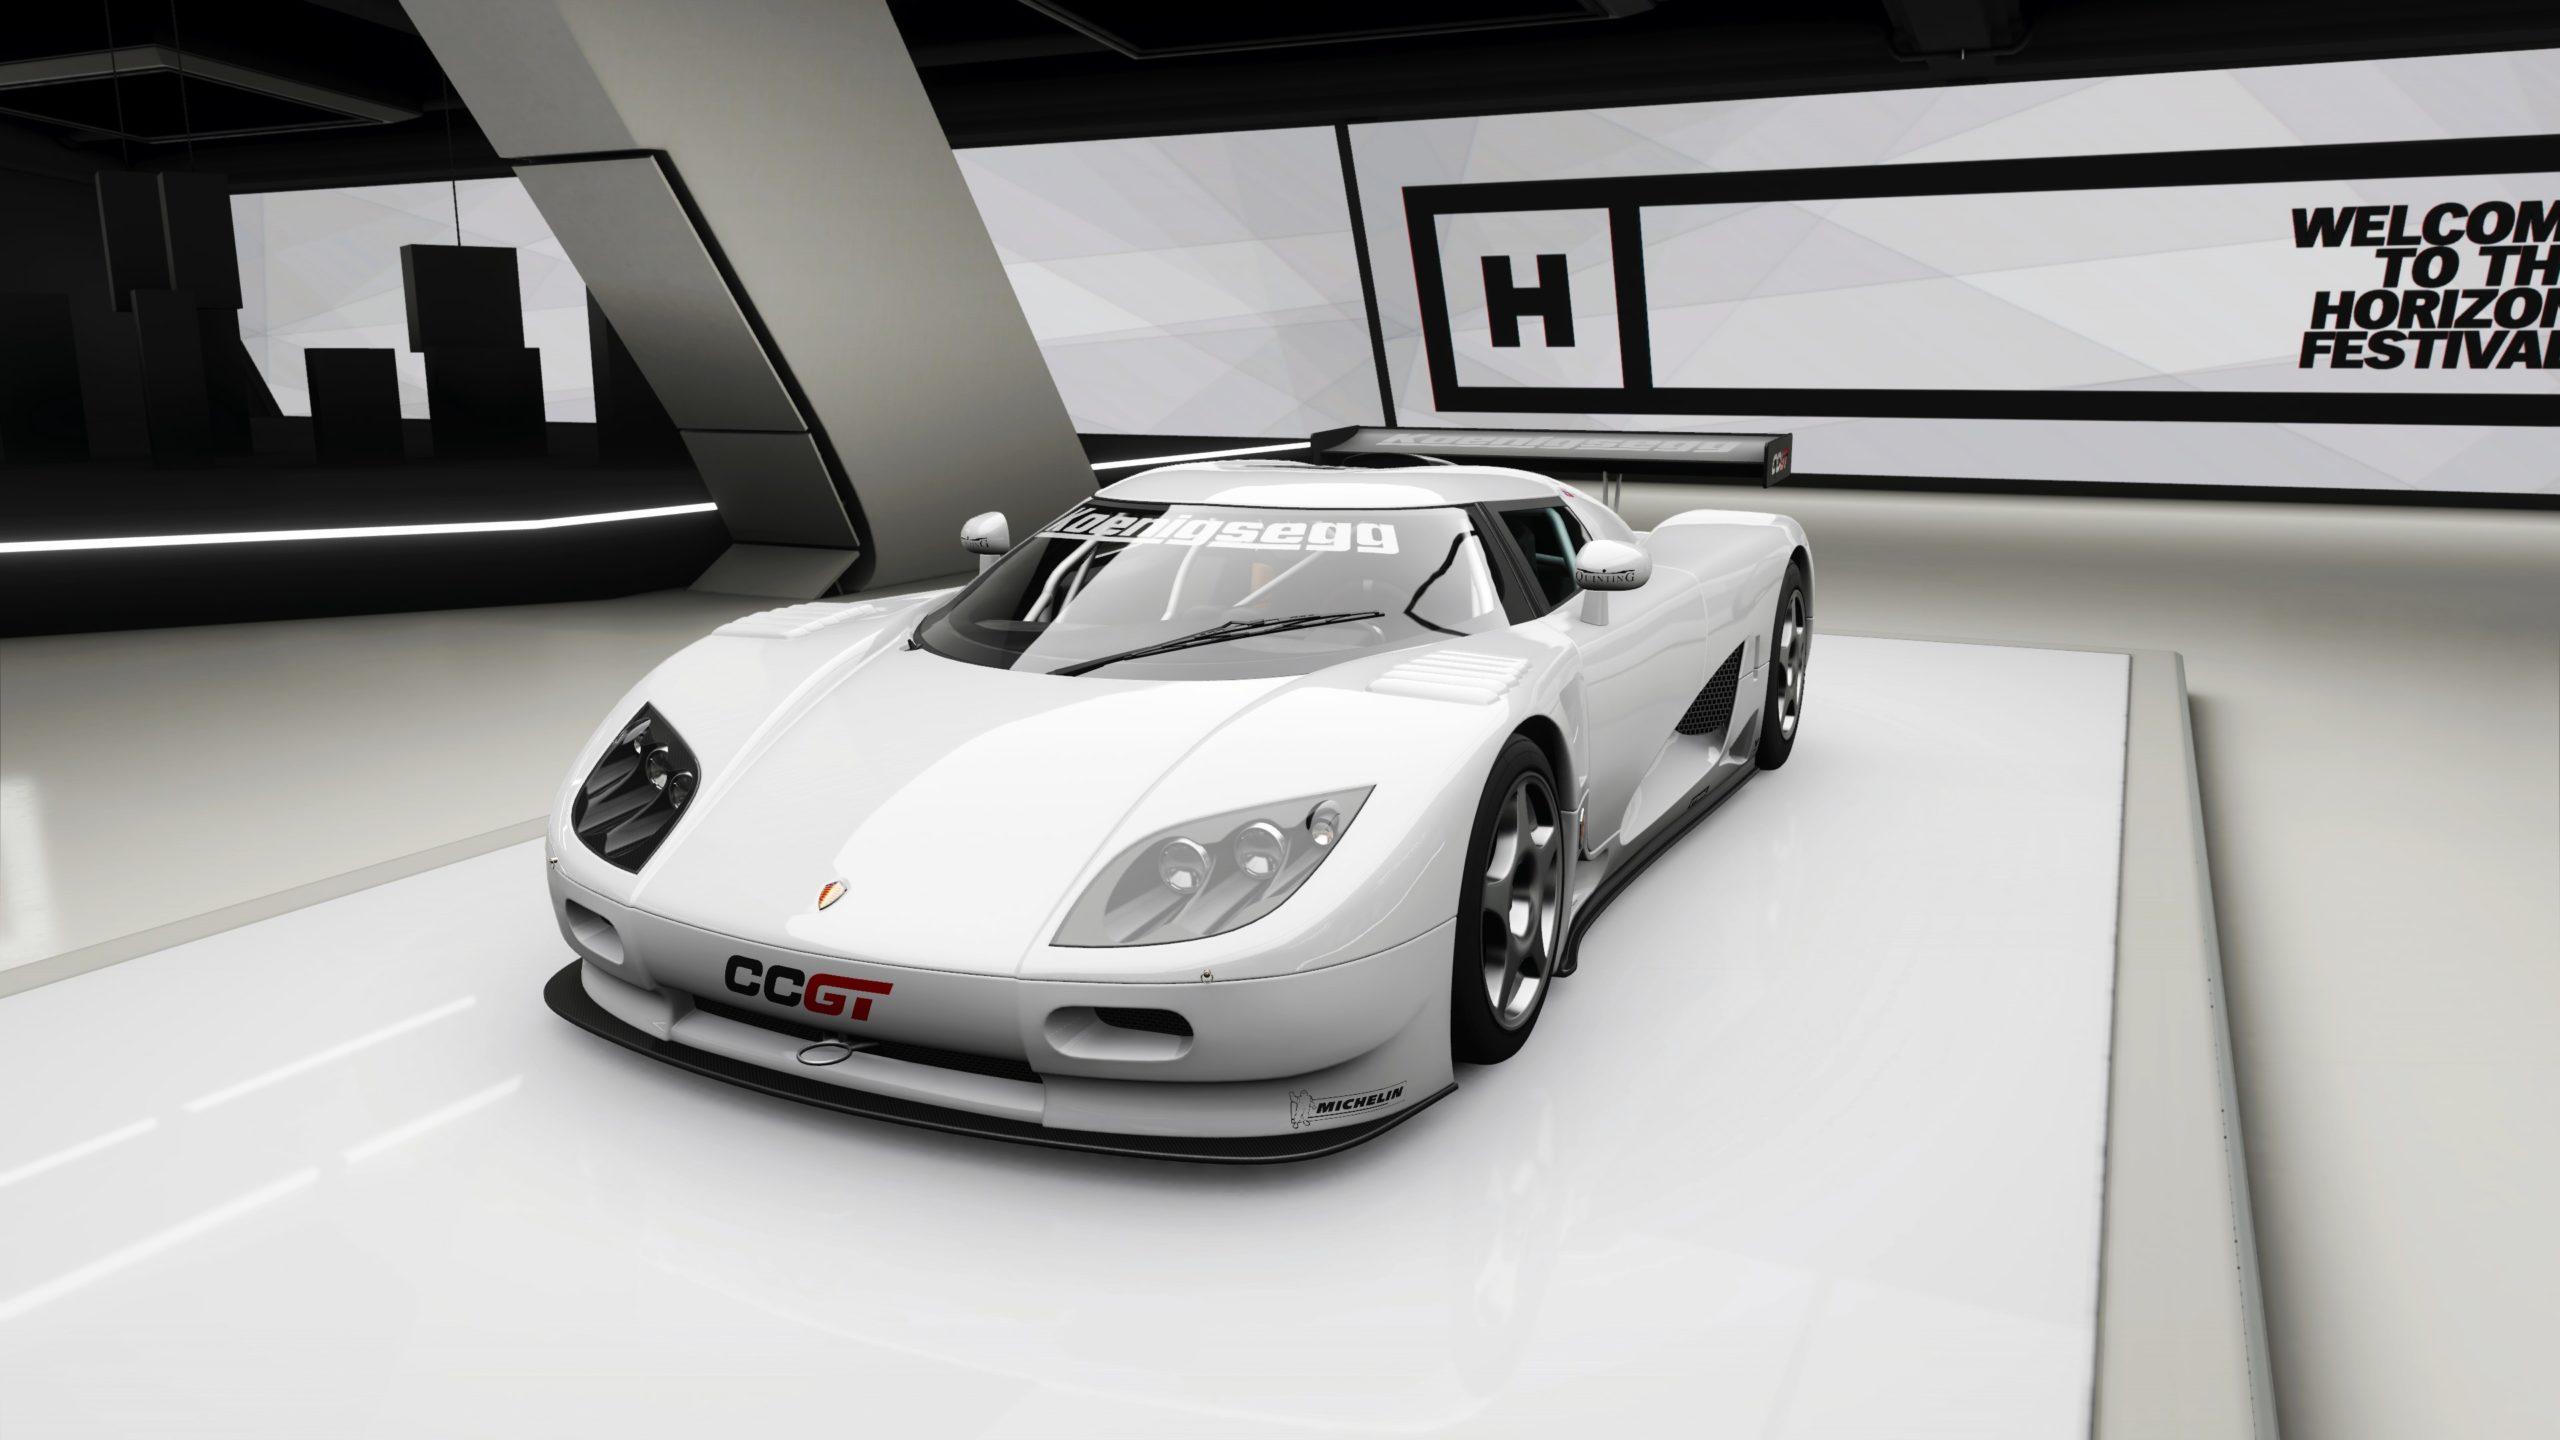 Forza-Horizon-4-Koenigsegg-CCGT